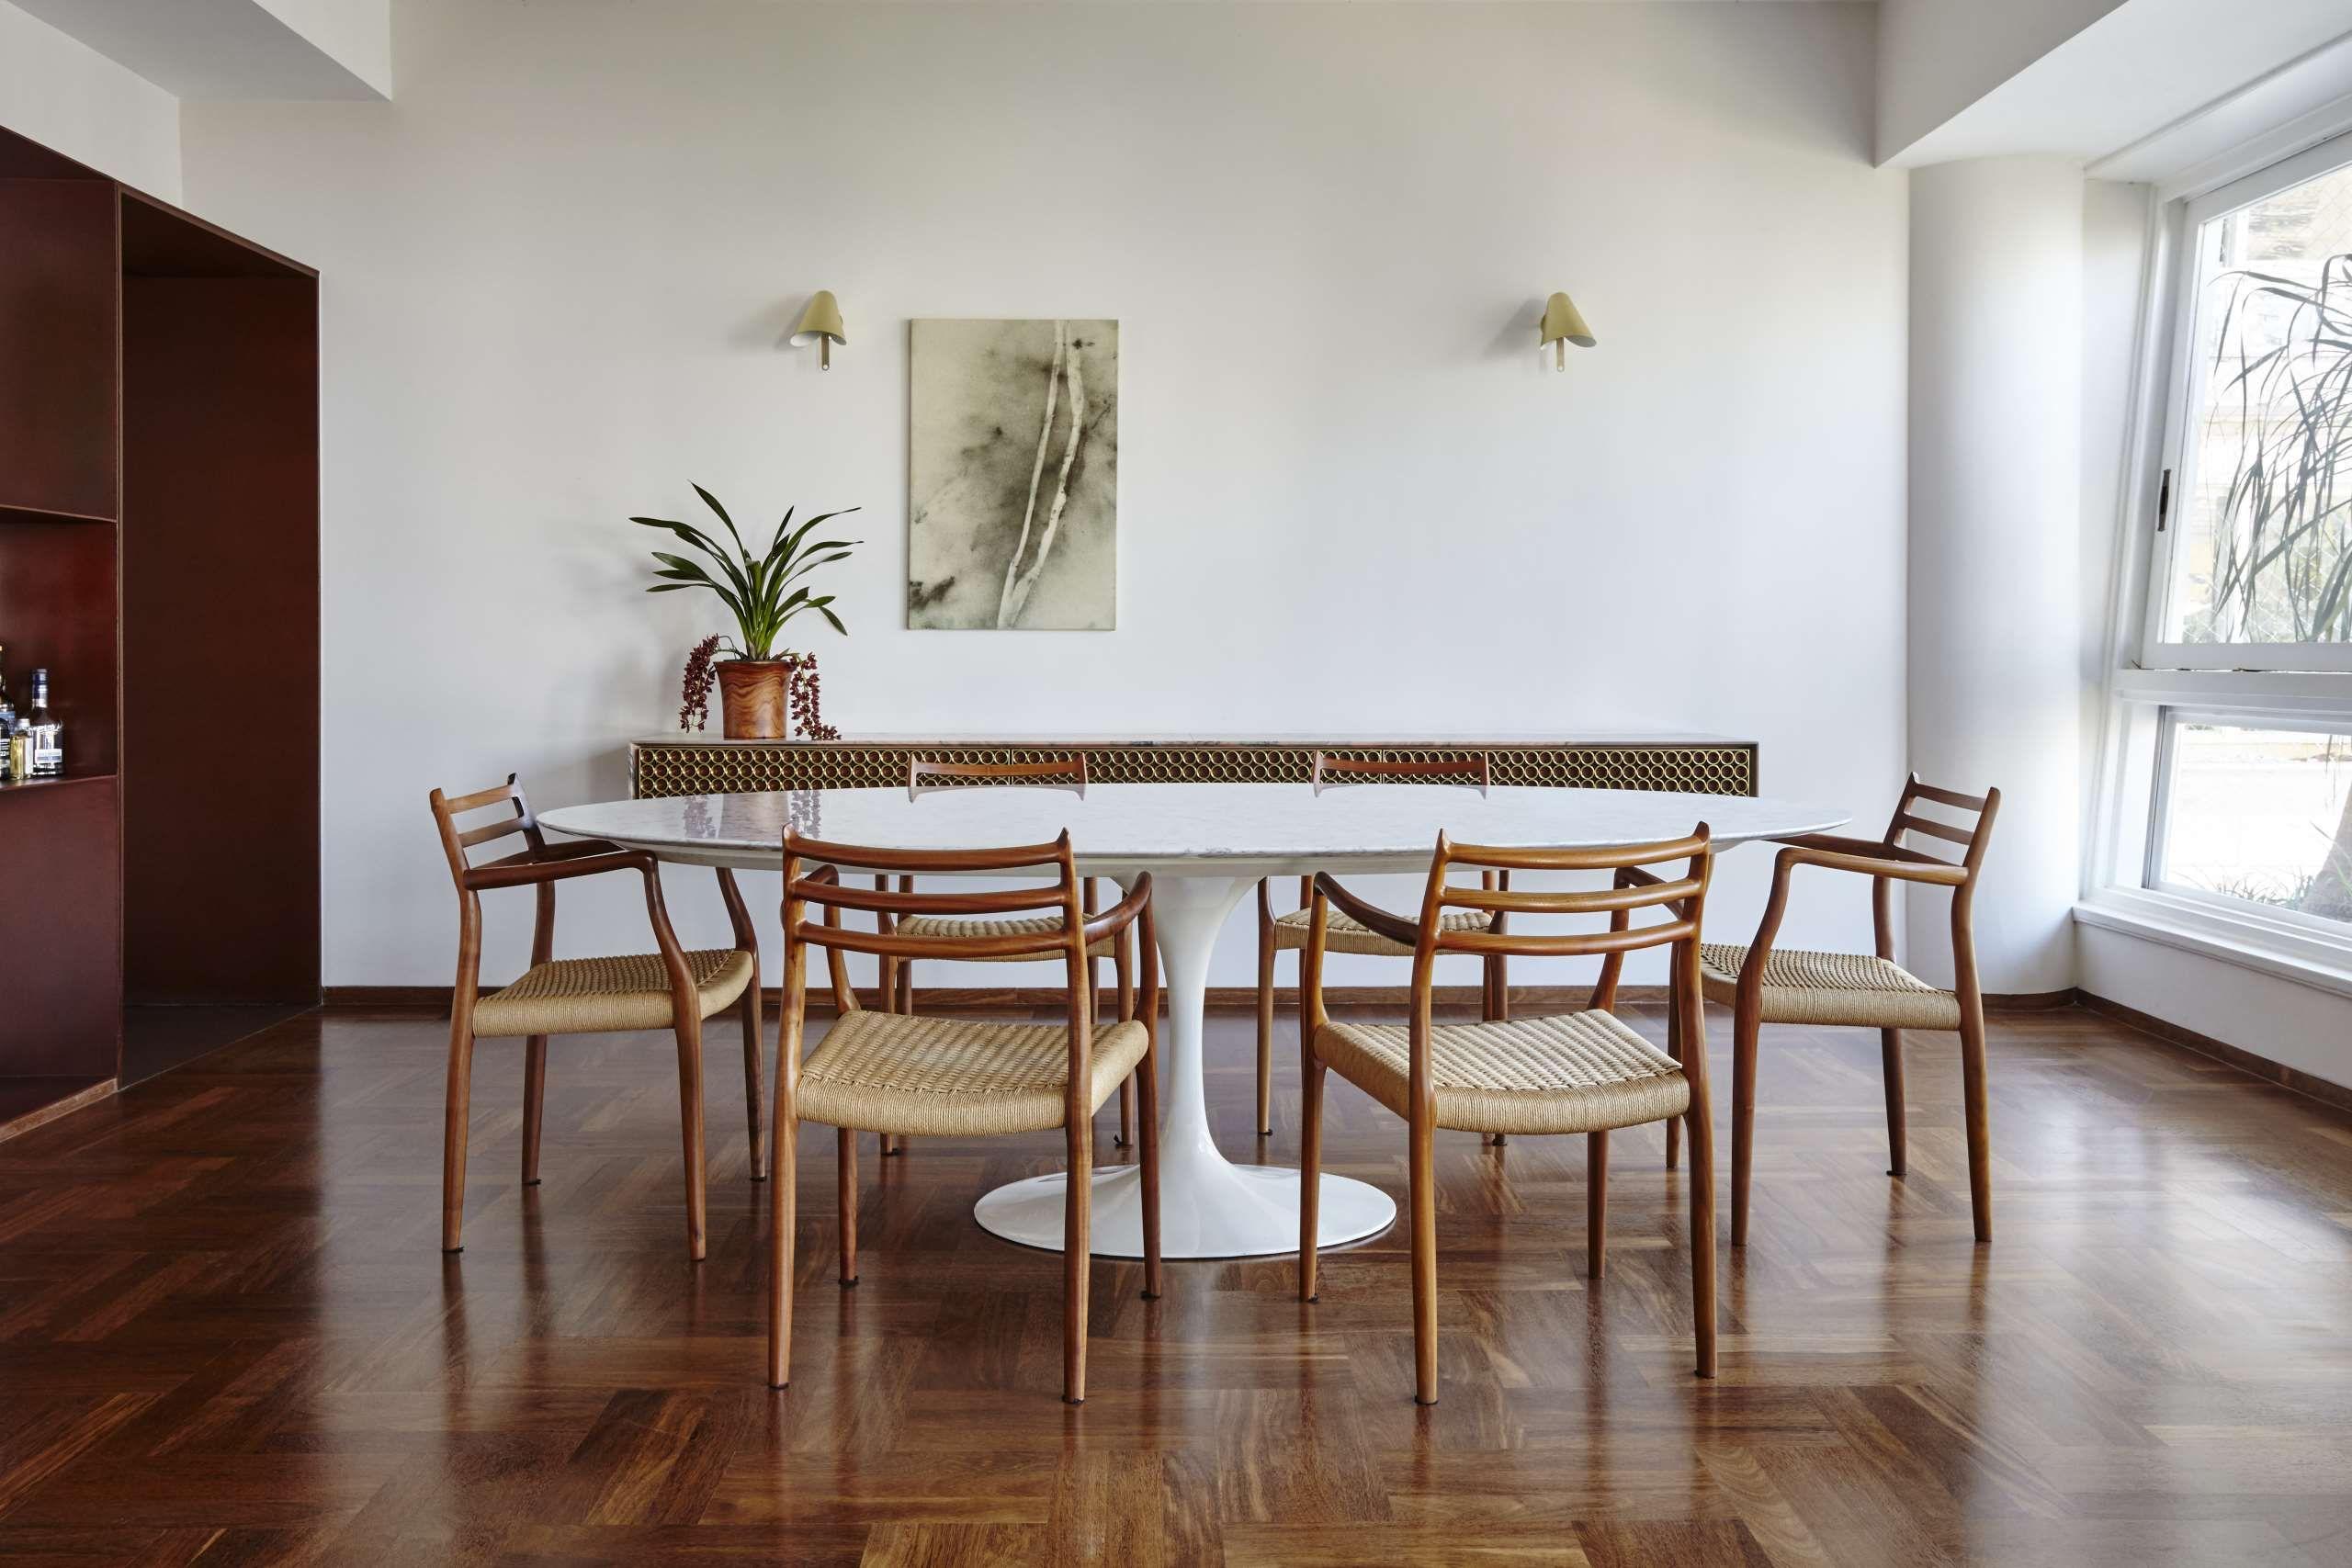 Brazilian Modernism Revamped The VA Apartment in São